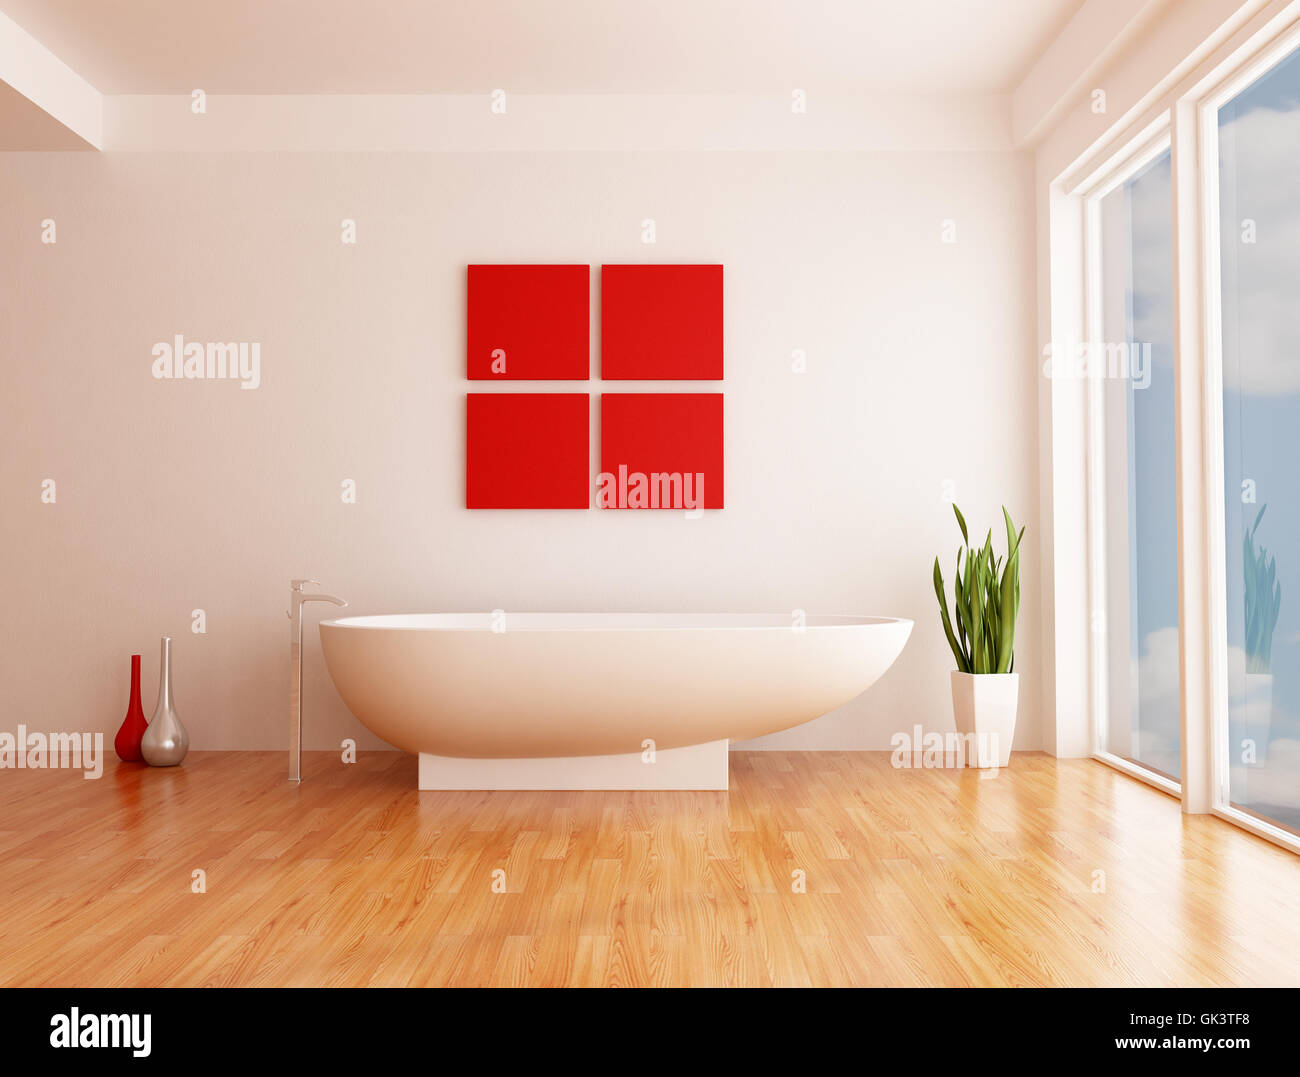 furniture interior bath tub - Stock Image